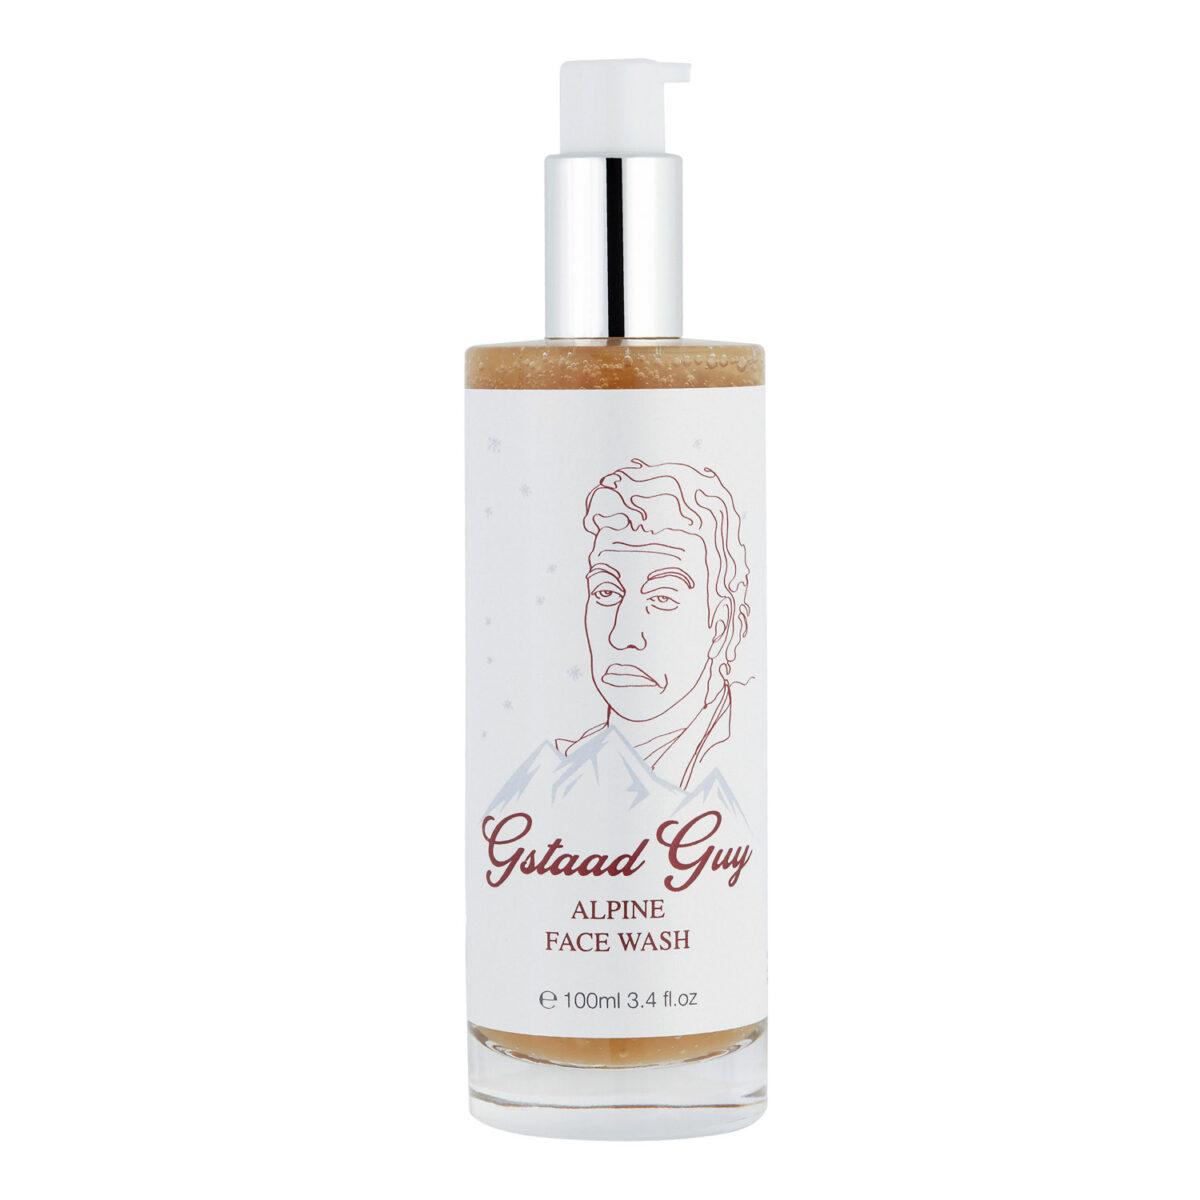 Gstaad Guy Alpine Face Wash Fresh + Invigorating